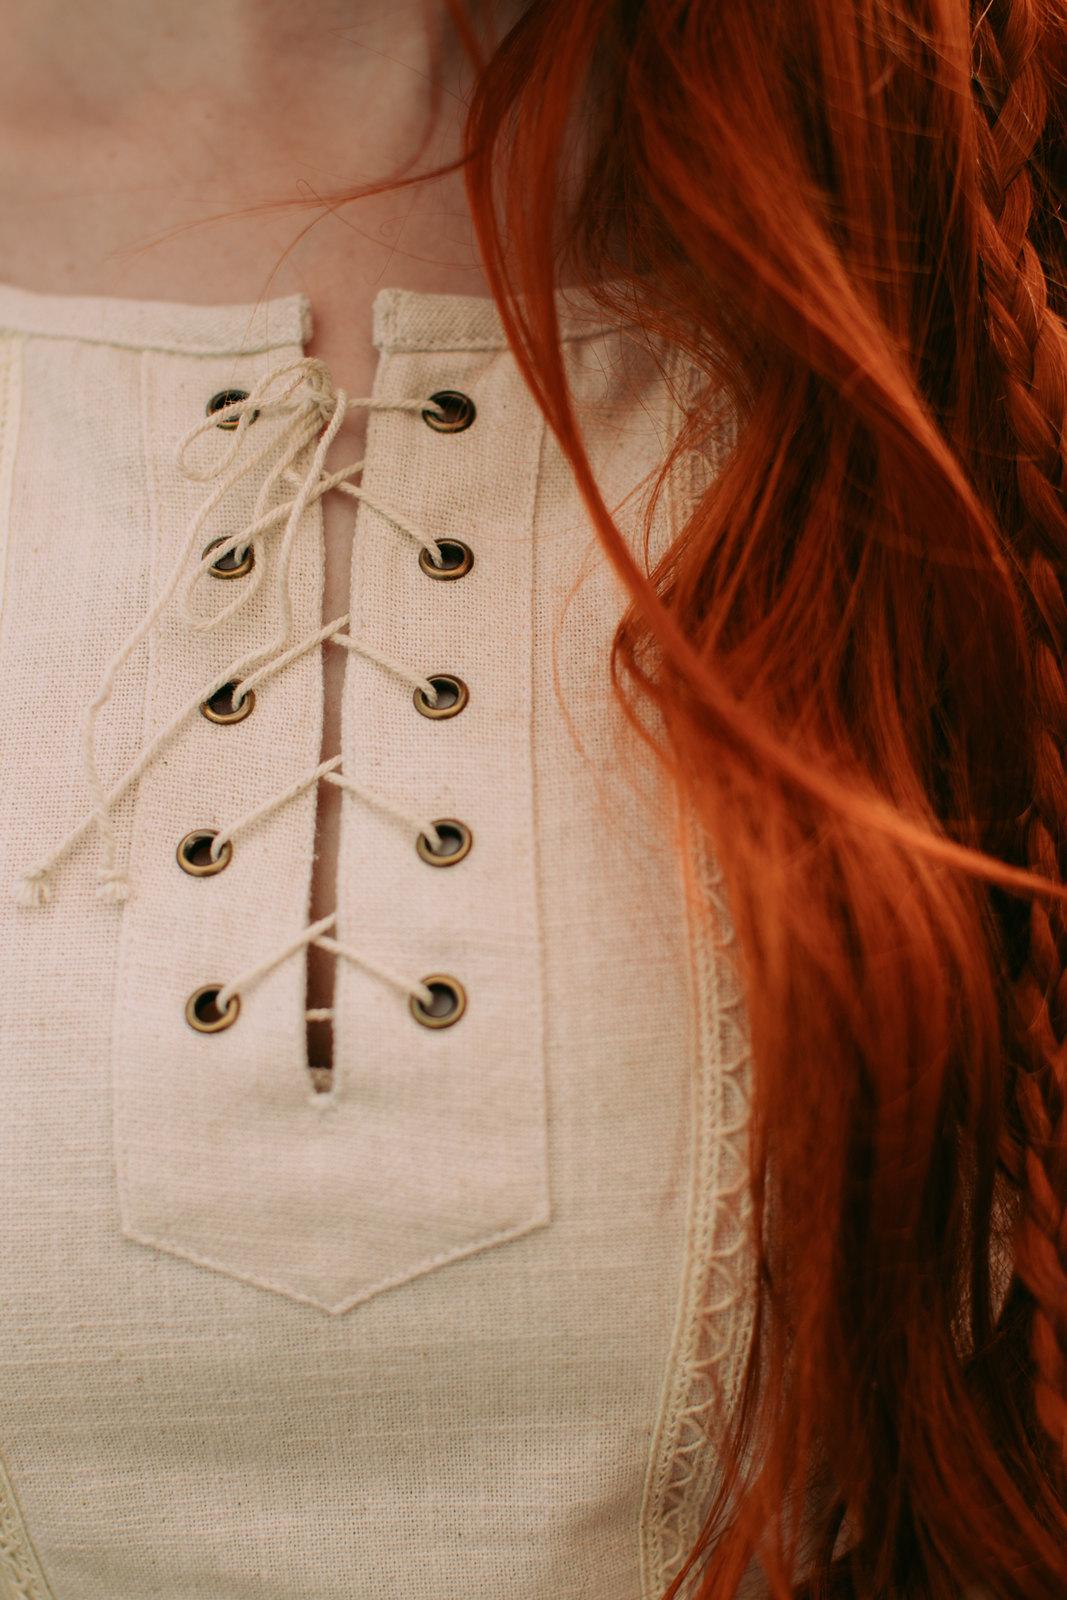 grace o'malley, pirate queen, clare island, celtic fusion, cottagefairy, piratecore, ethical irish fashion, sustainable fashion, irish design, irish brand, irish fashion